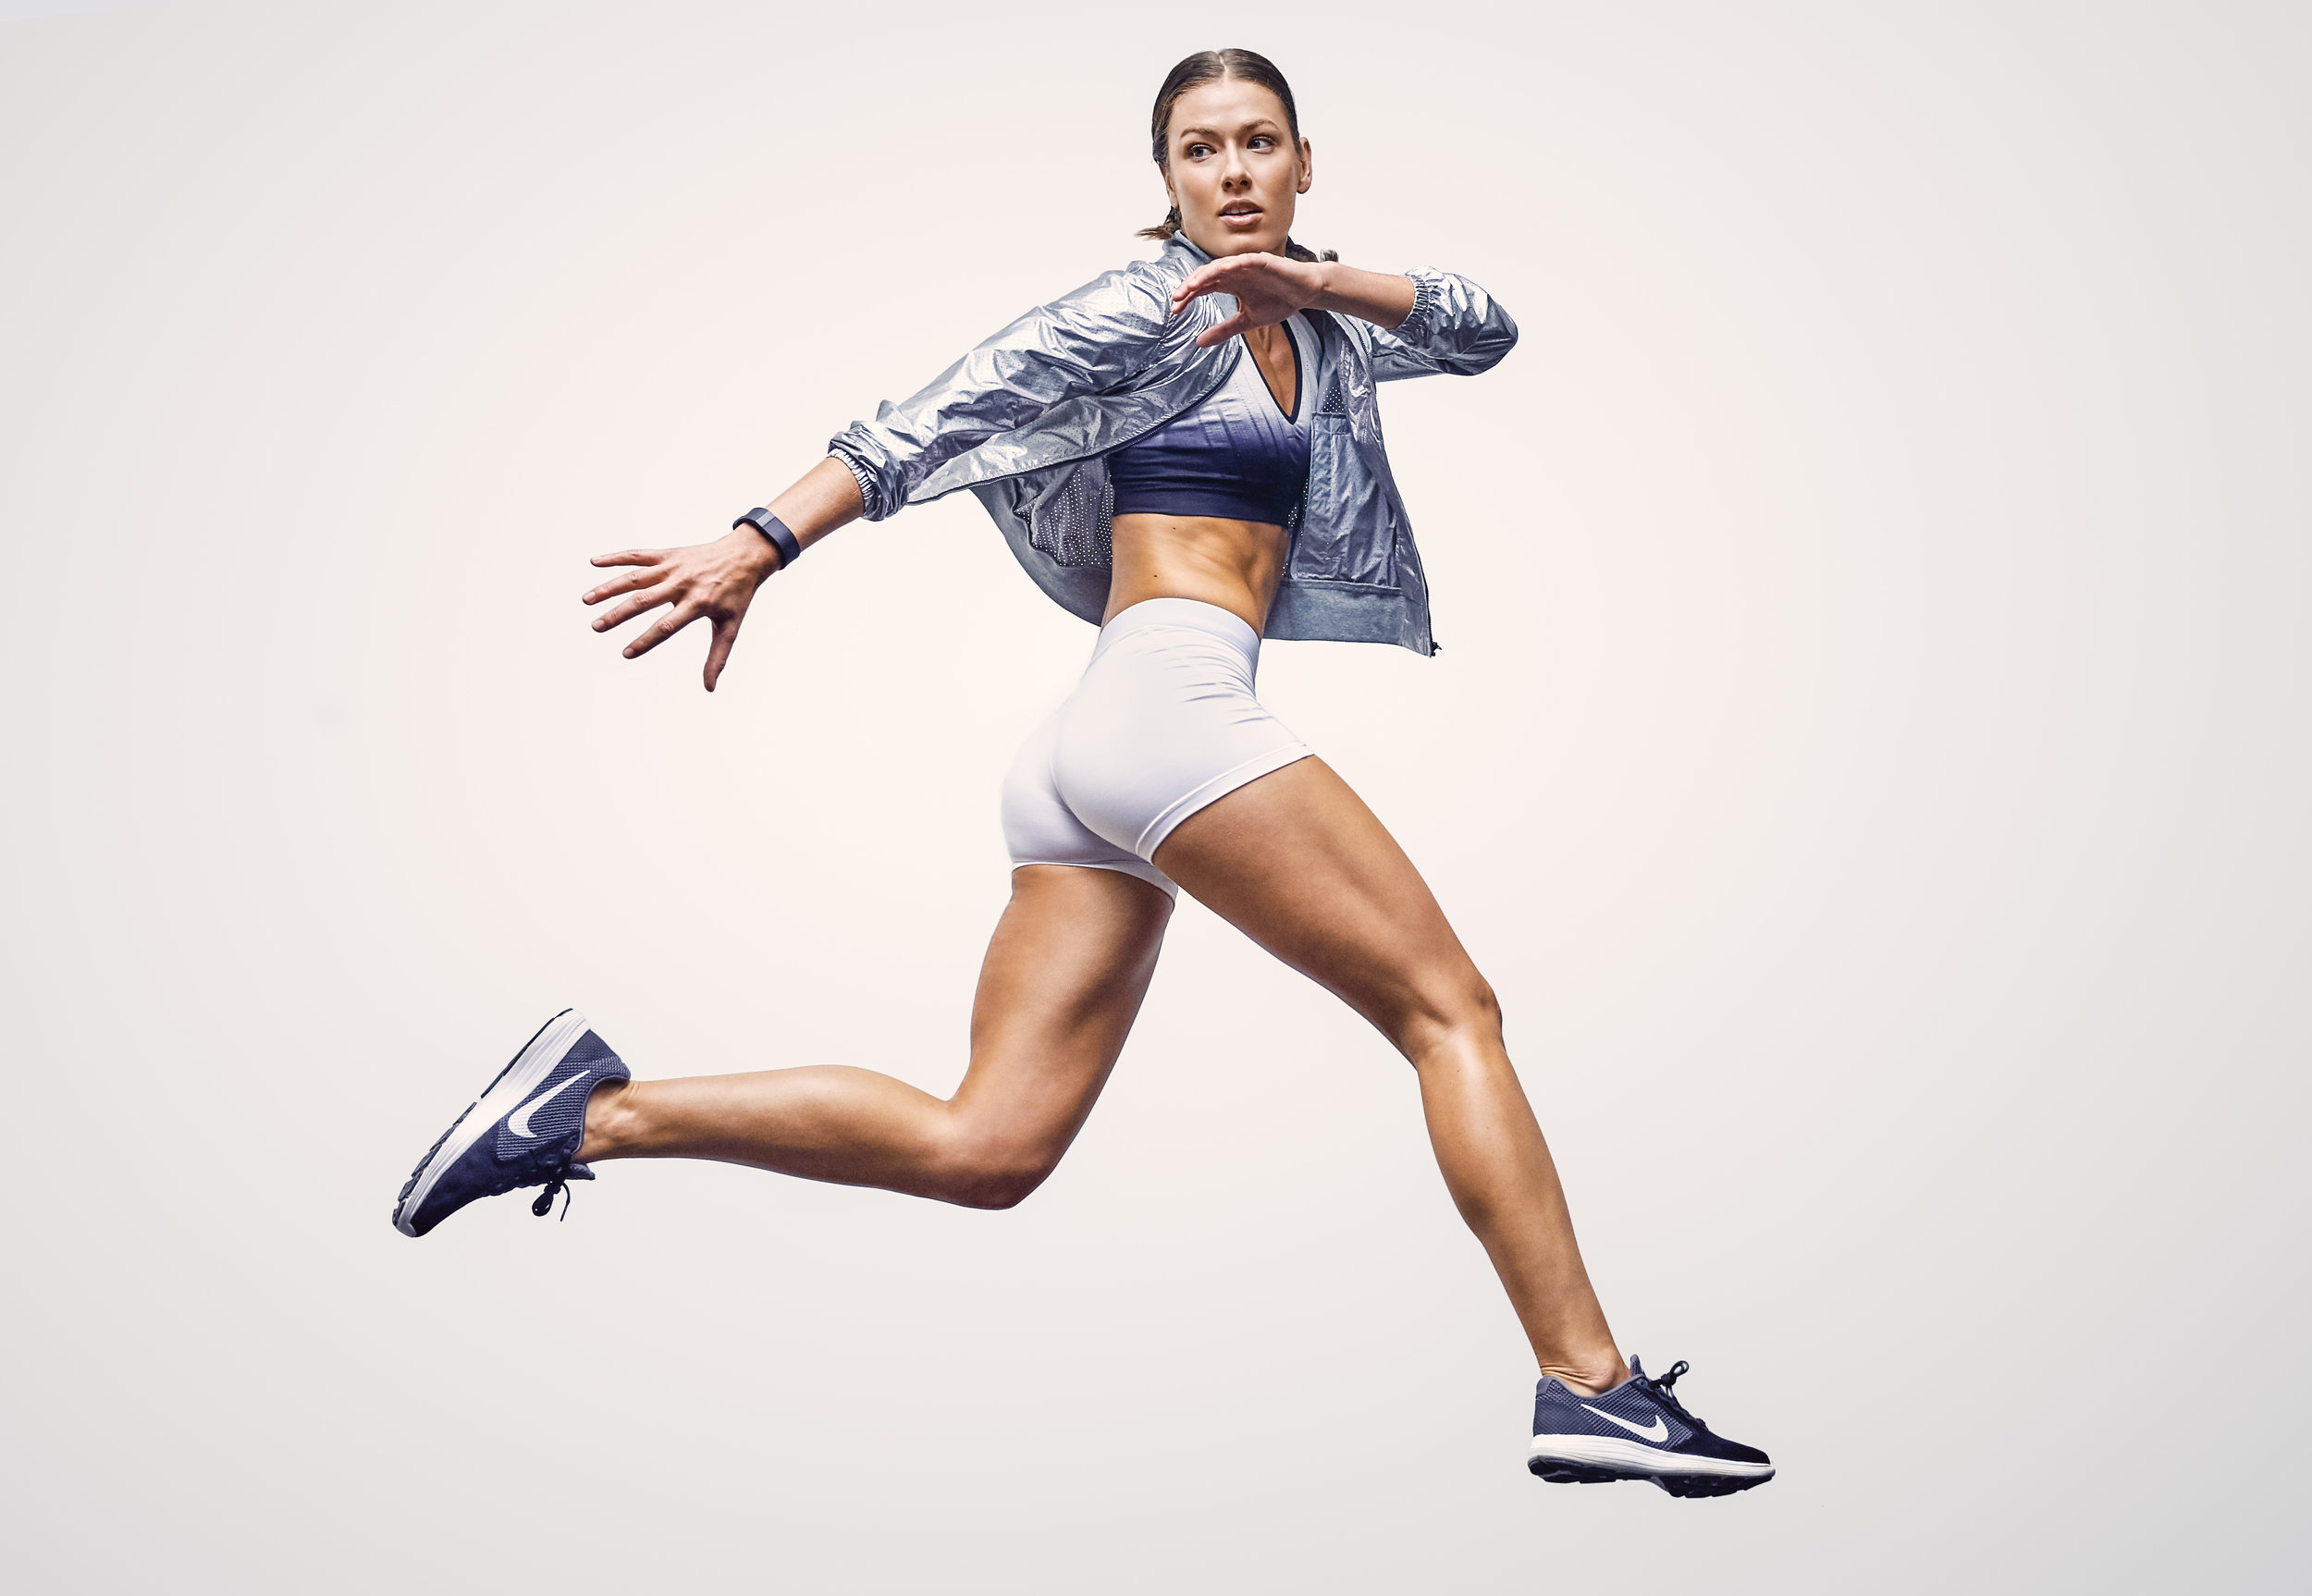 OBJKTV_MaxRes_Fitness_Nike Studio Shoot7812.jpg